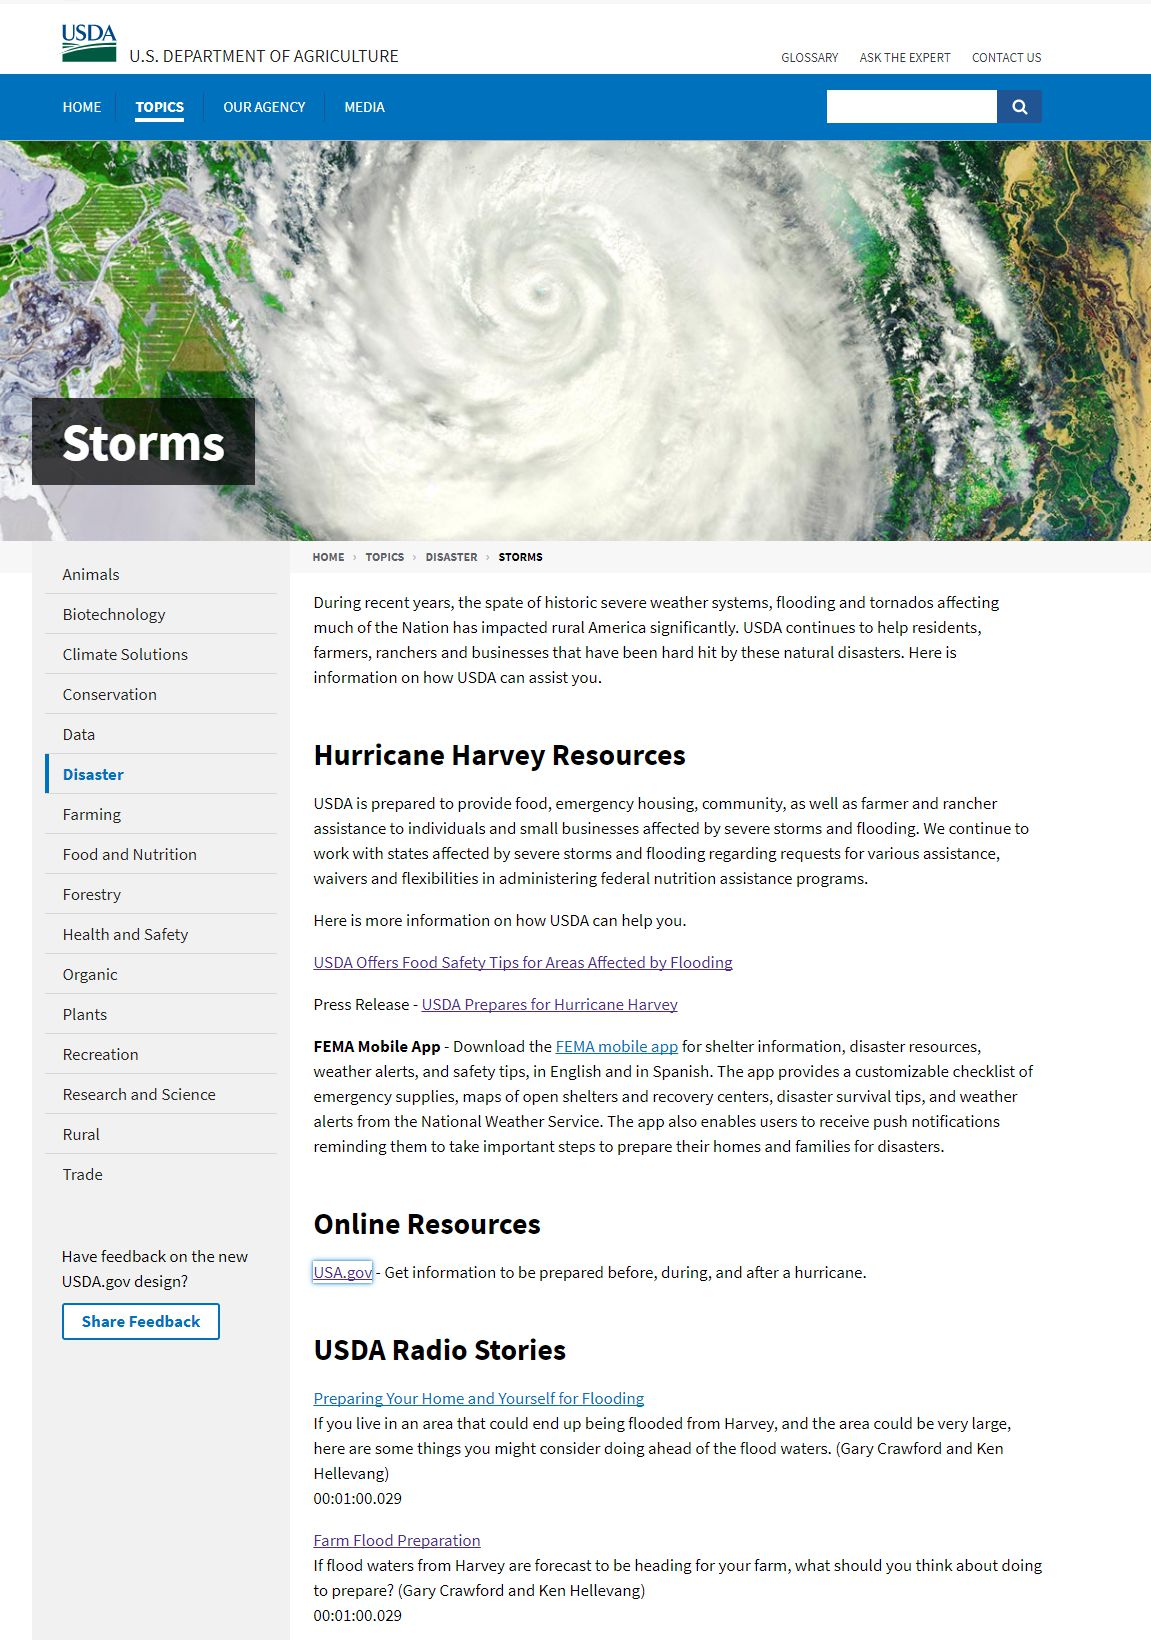 USDA.gov's Hurricane Harvey page